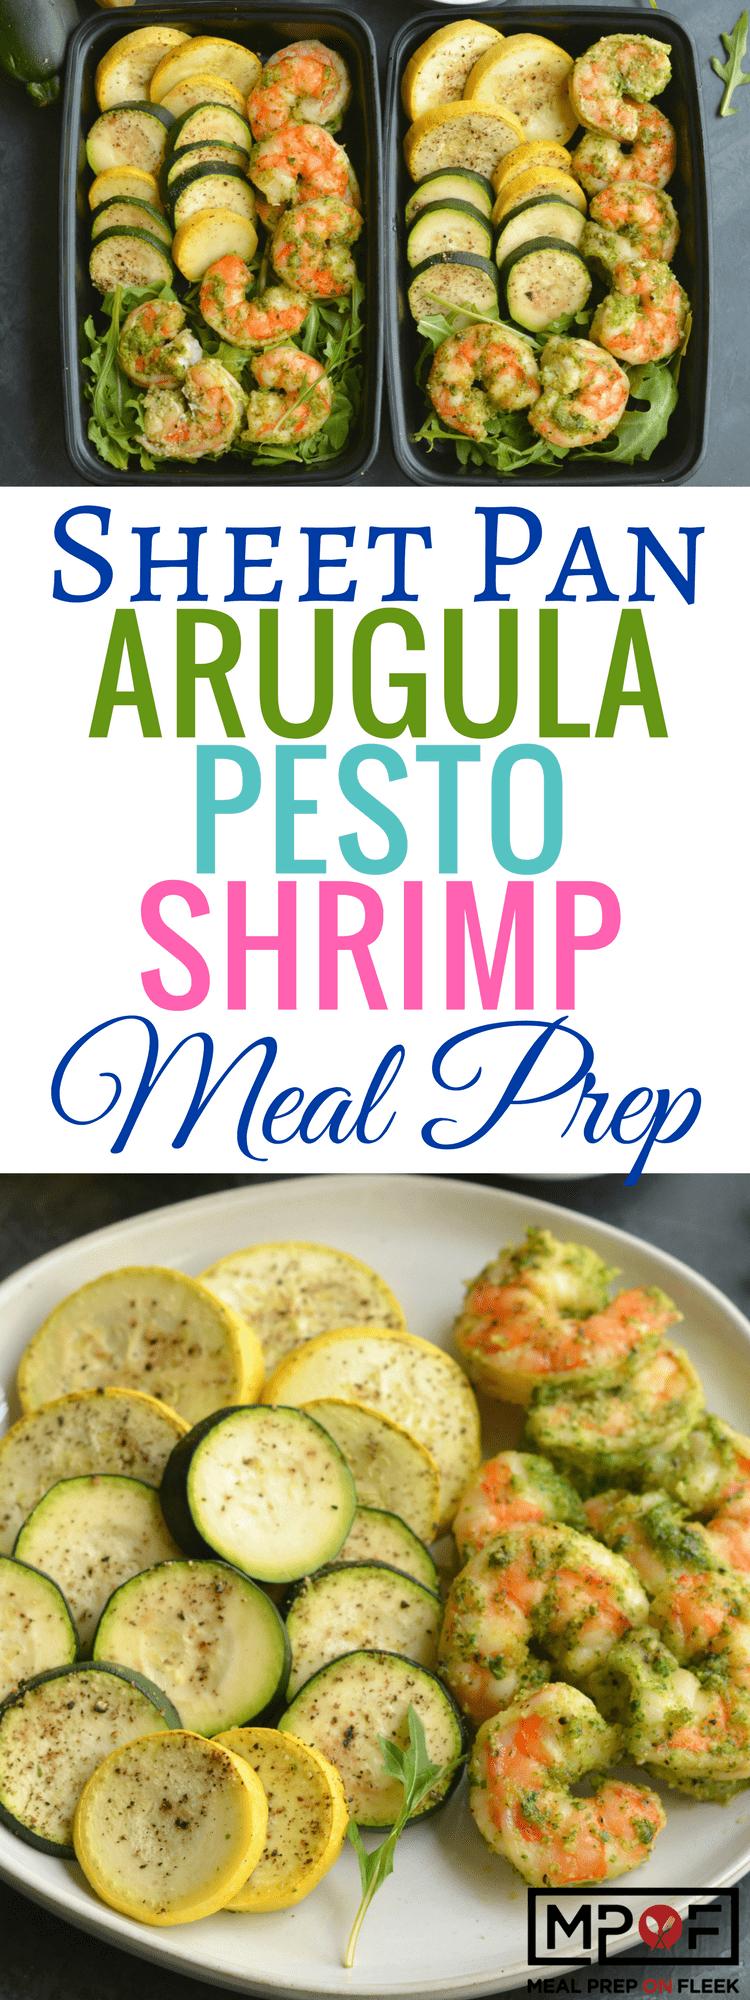 Sheet Pan Arugula Pesto Shrimp Meal Prep